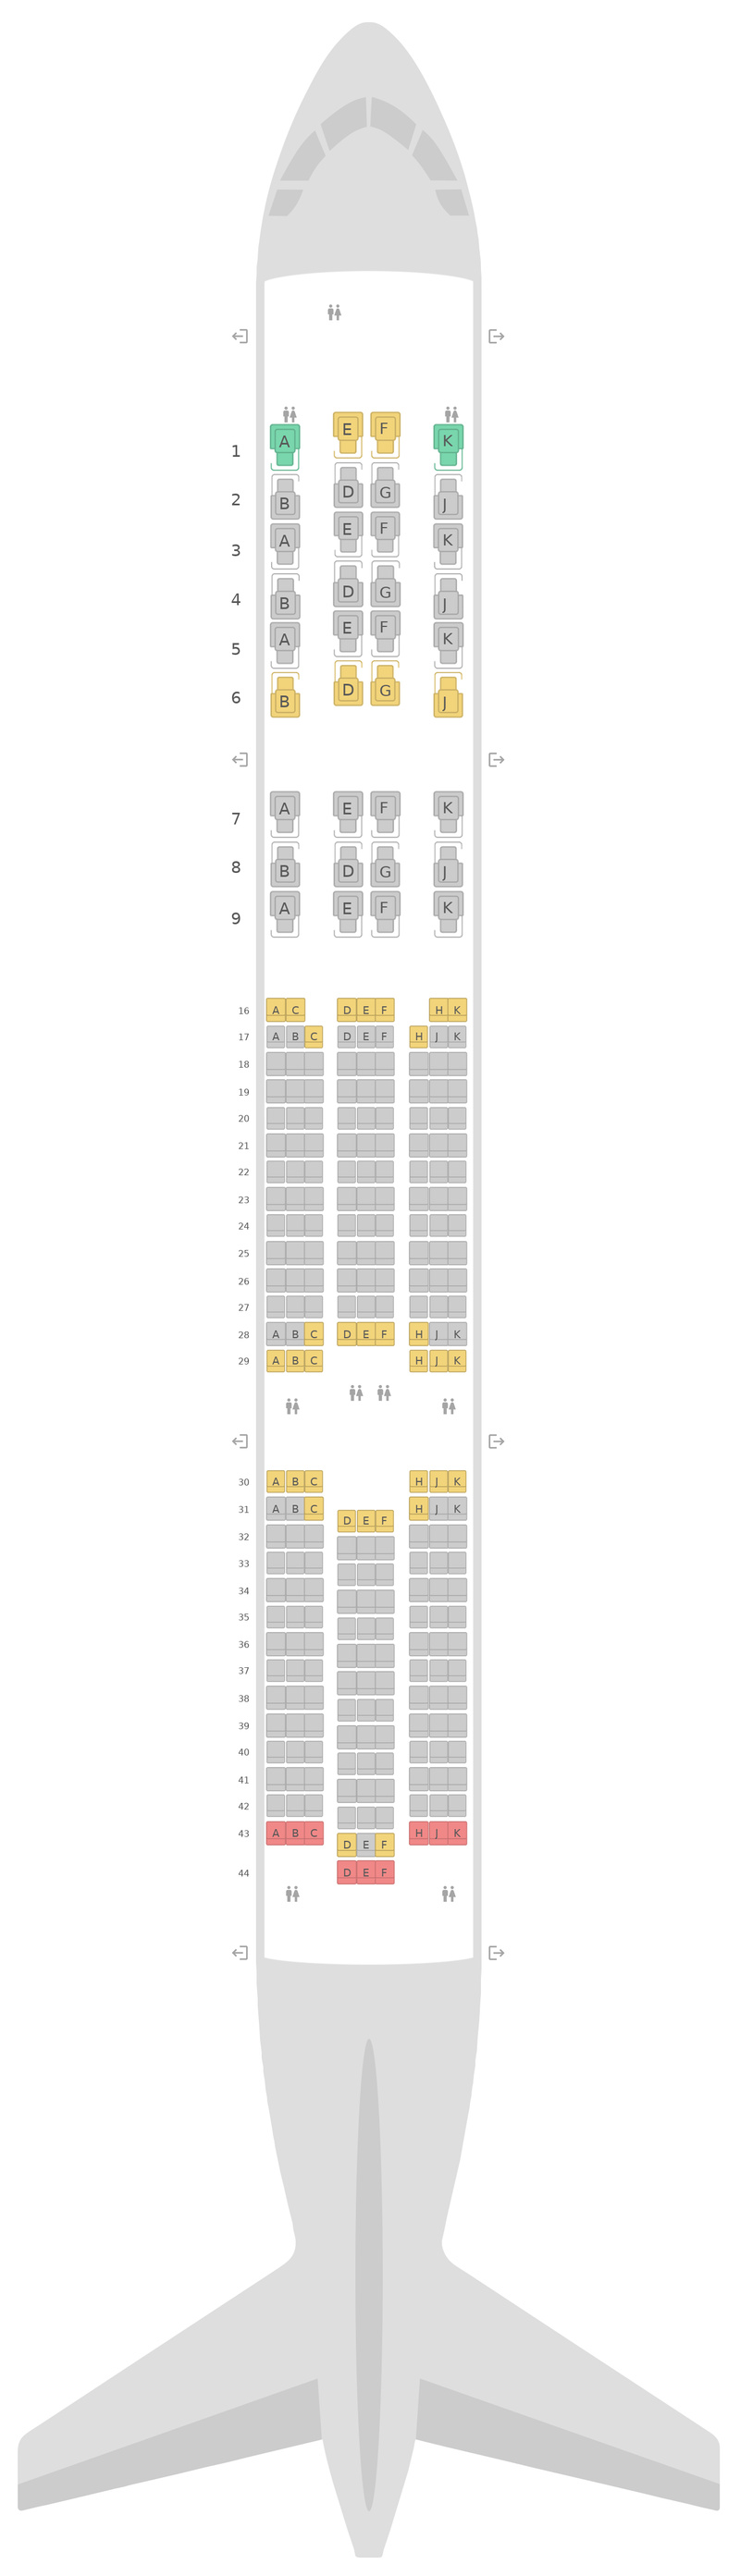 Схема салона Аэробус А350-900 (359) Qsuite v2 Катарские Авиалинии